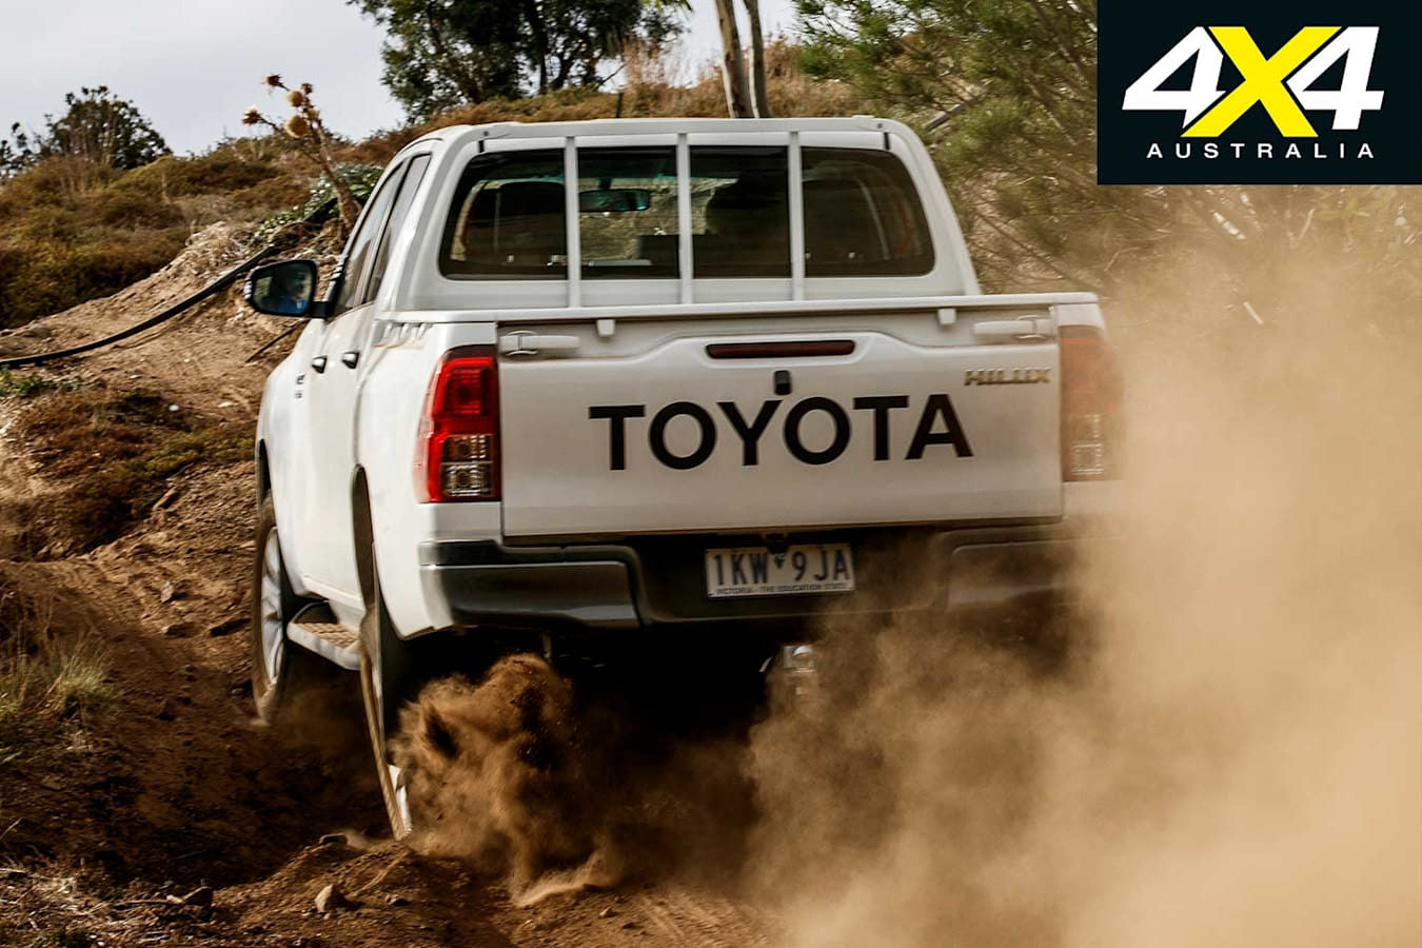 2018 Ute Test Toyota Hilux SR Rear Off Road Performance Jpg